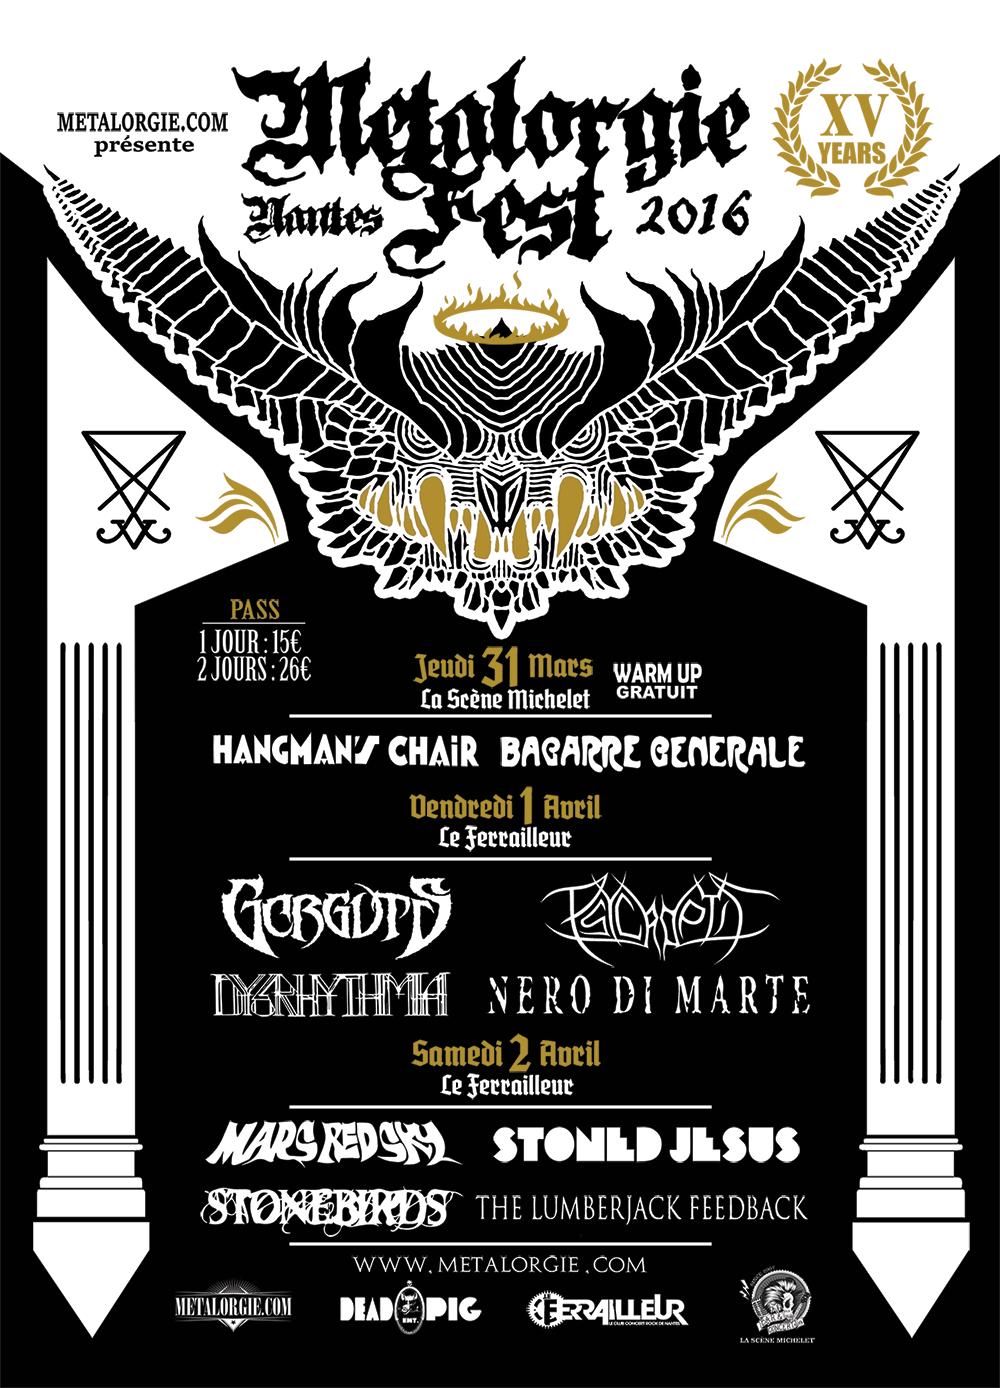 Metalorgie Fest 2016